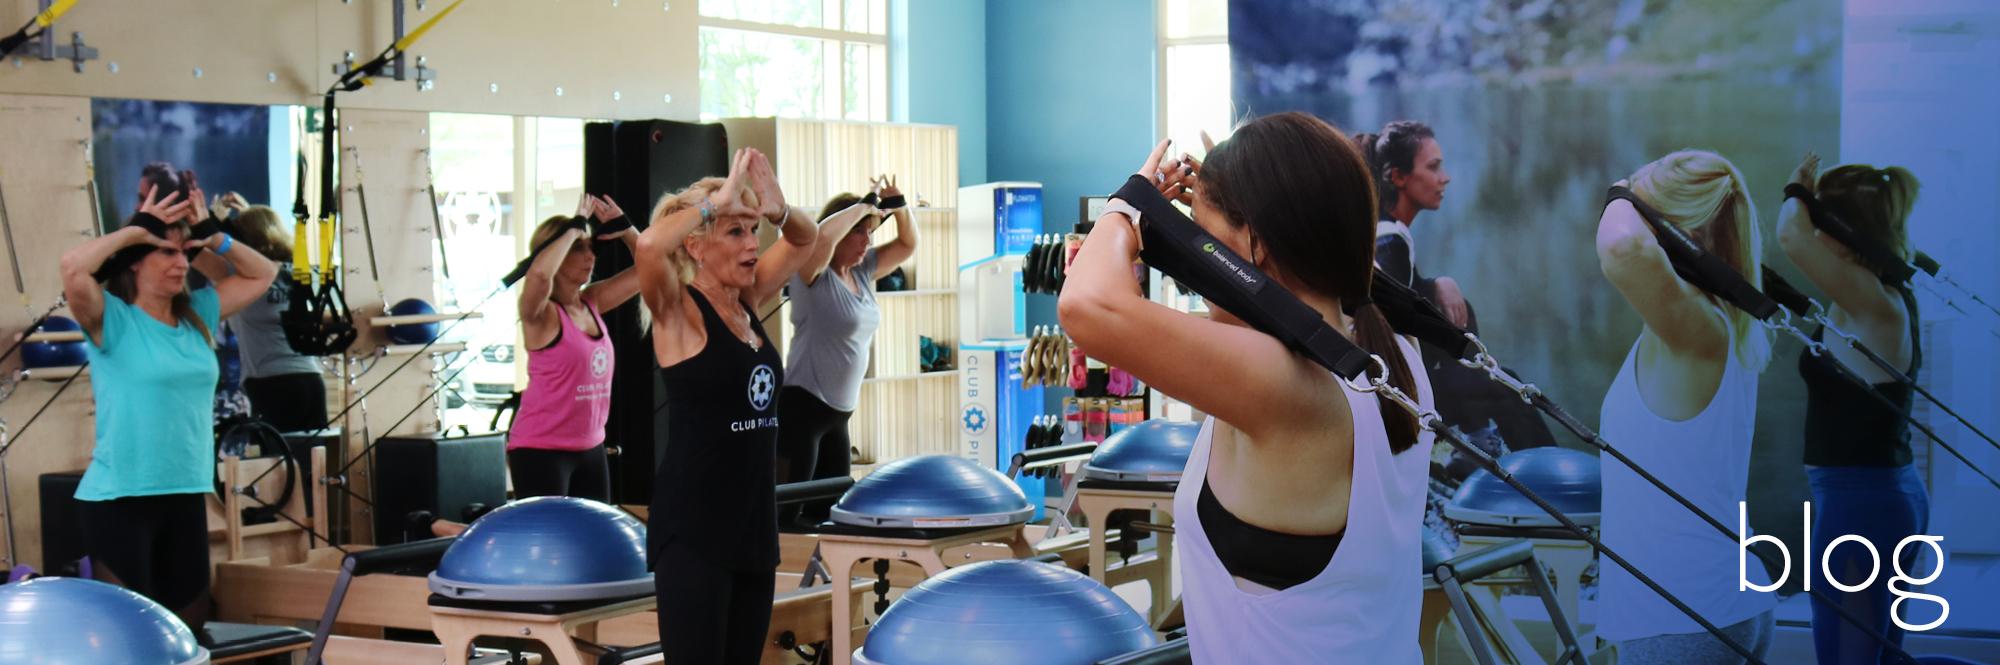 Blog | Club Pilates